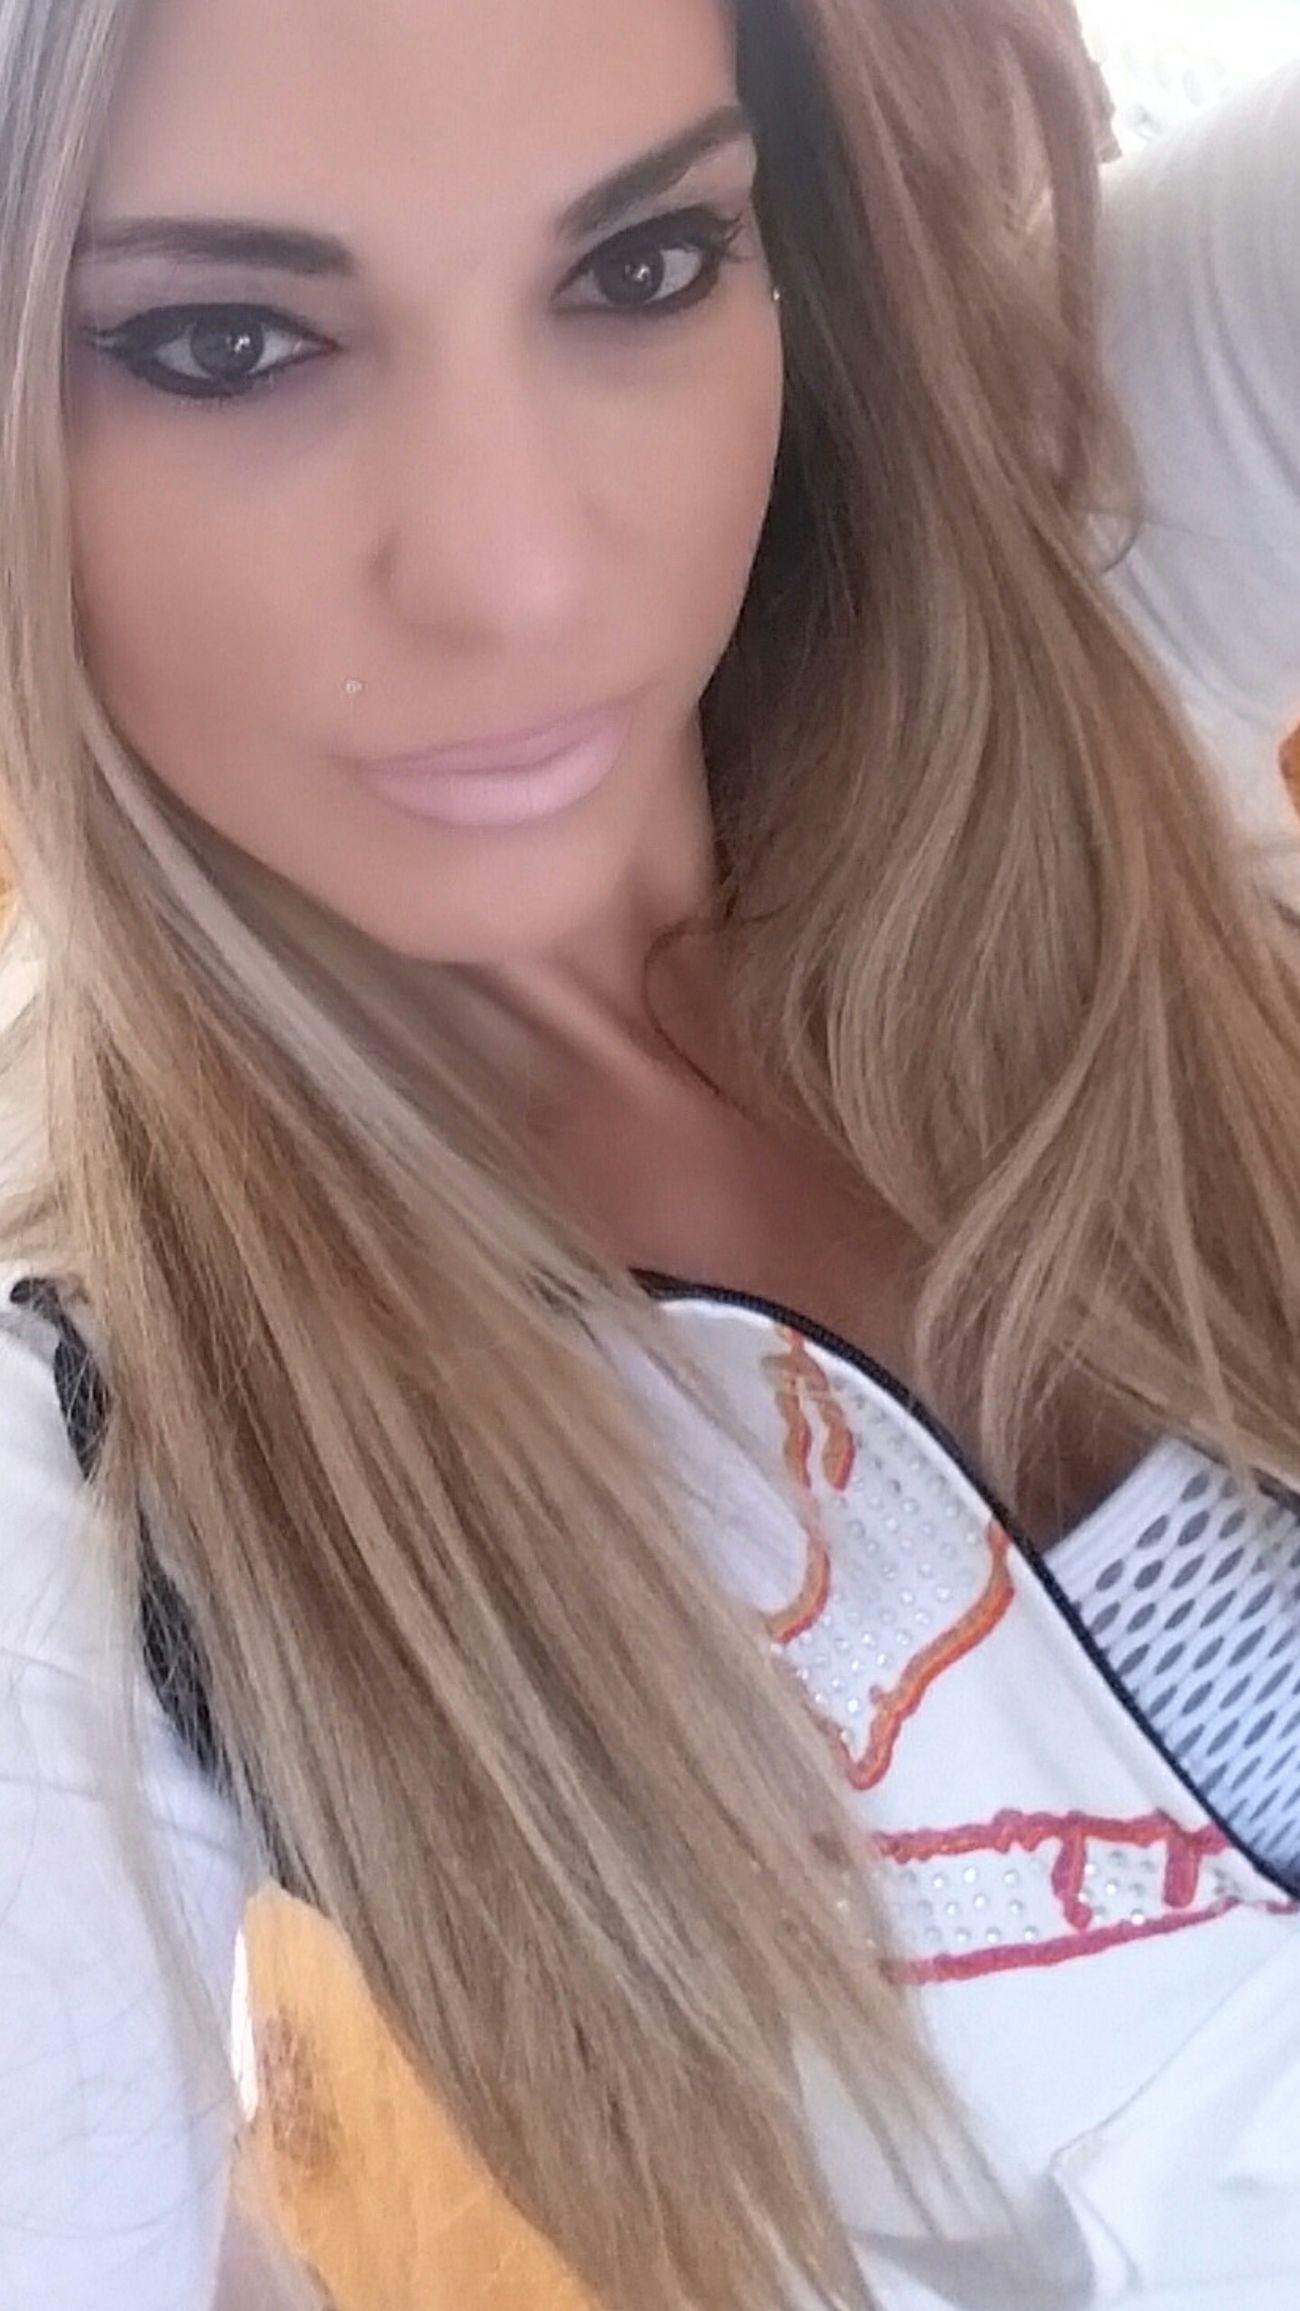 www.anastasiaverkos.com Selfieoftheday Big Eyes♡ Beautiful Girl Beautifullips Lovelovelove Happy :) Enjoying Life Healthyliving GymTime Hanging Out